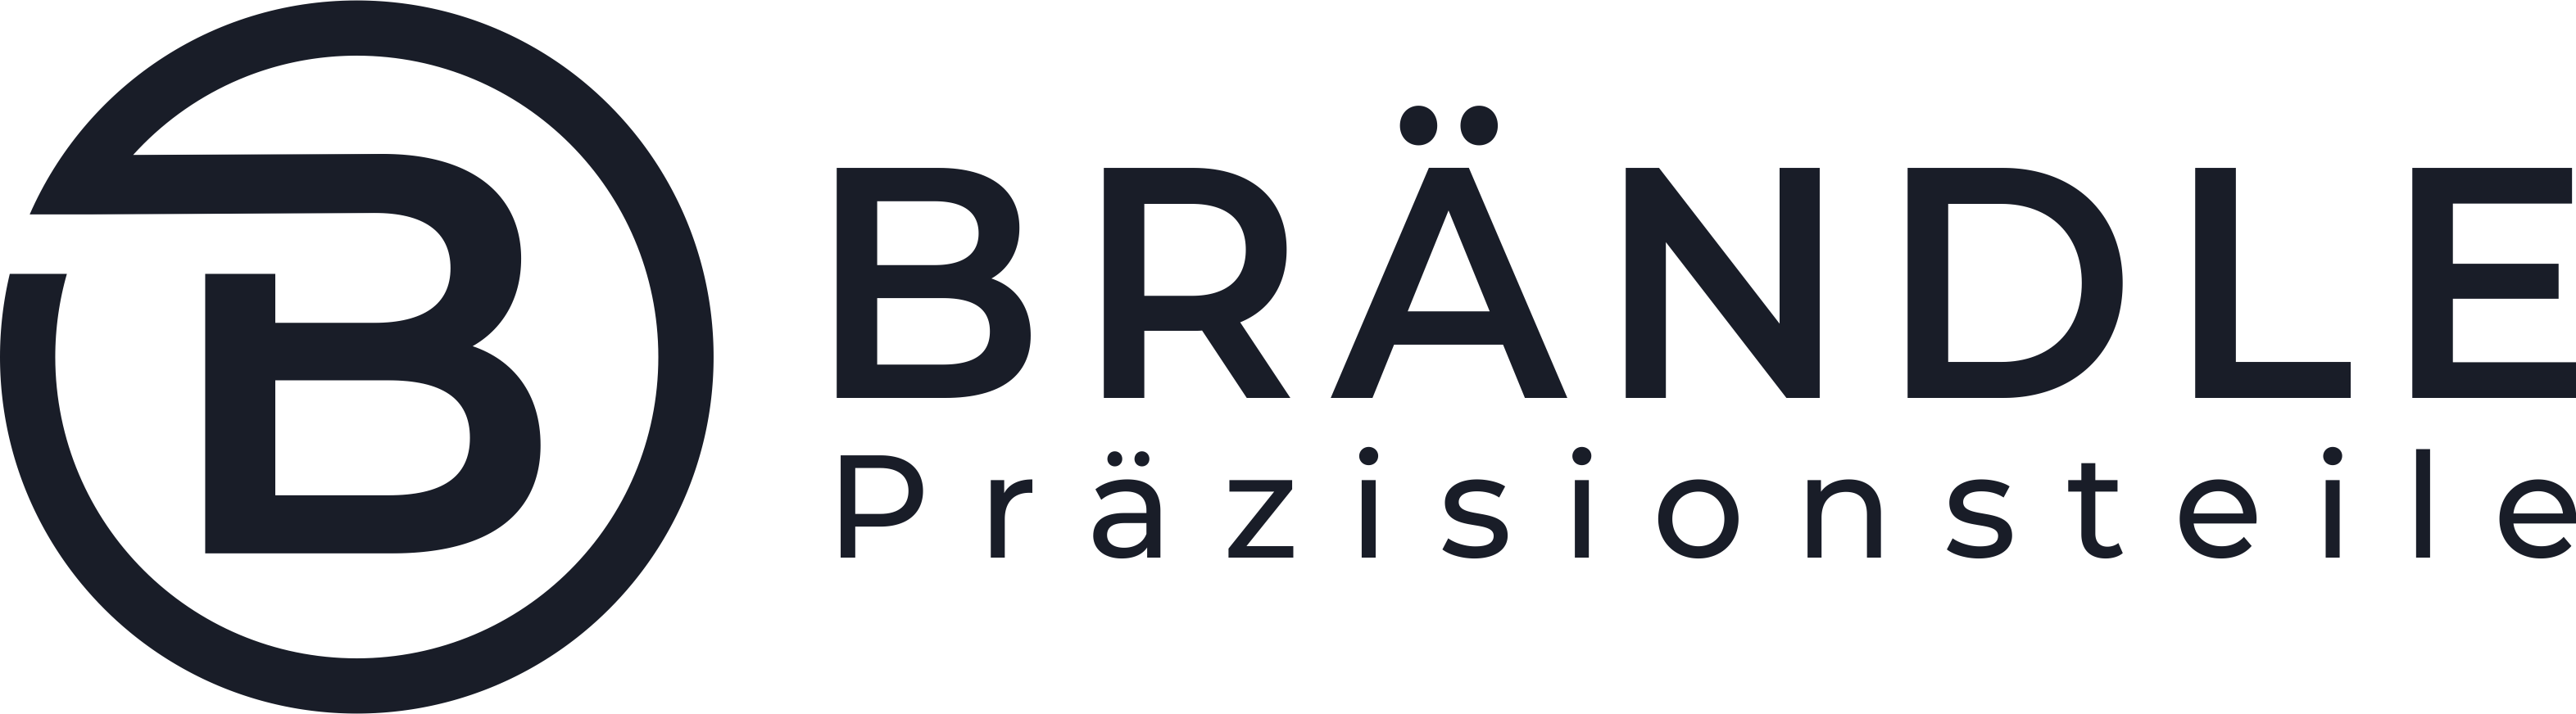 Brändle Logo Navbar